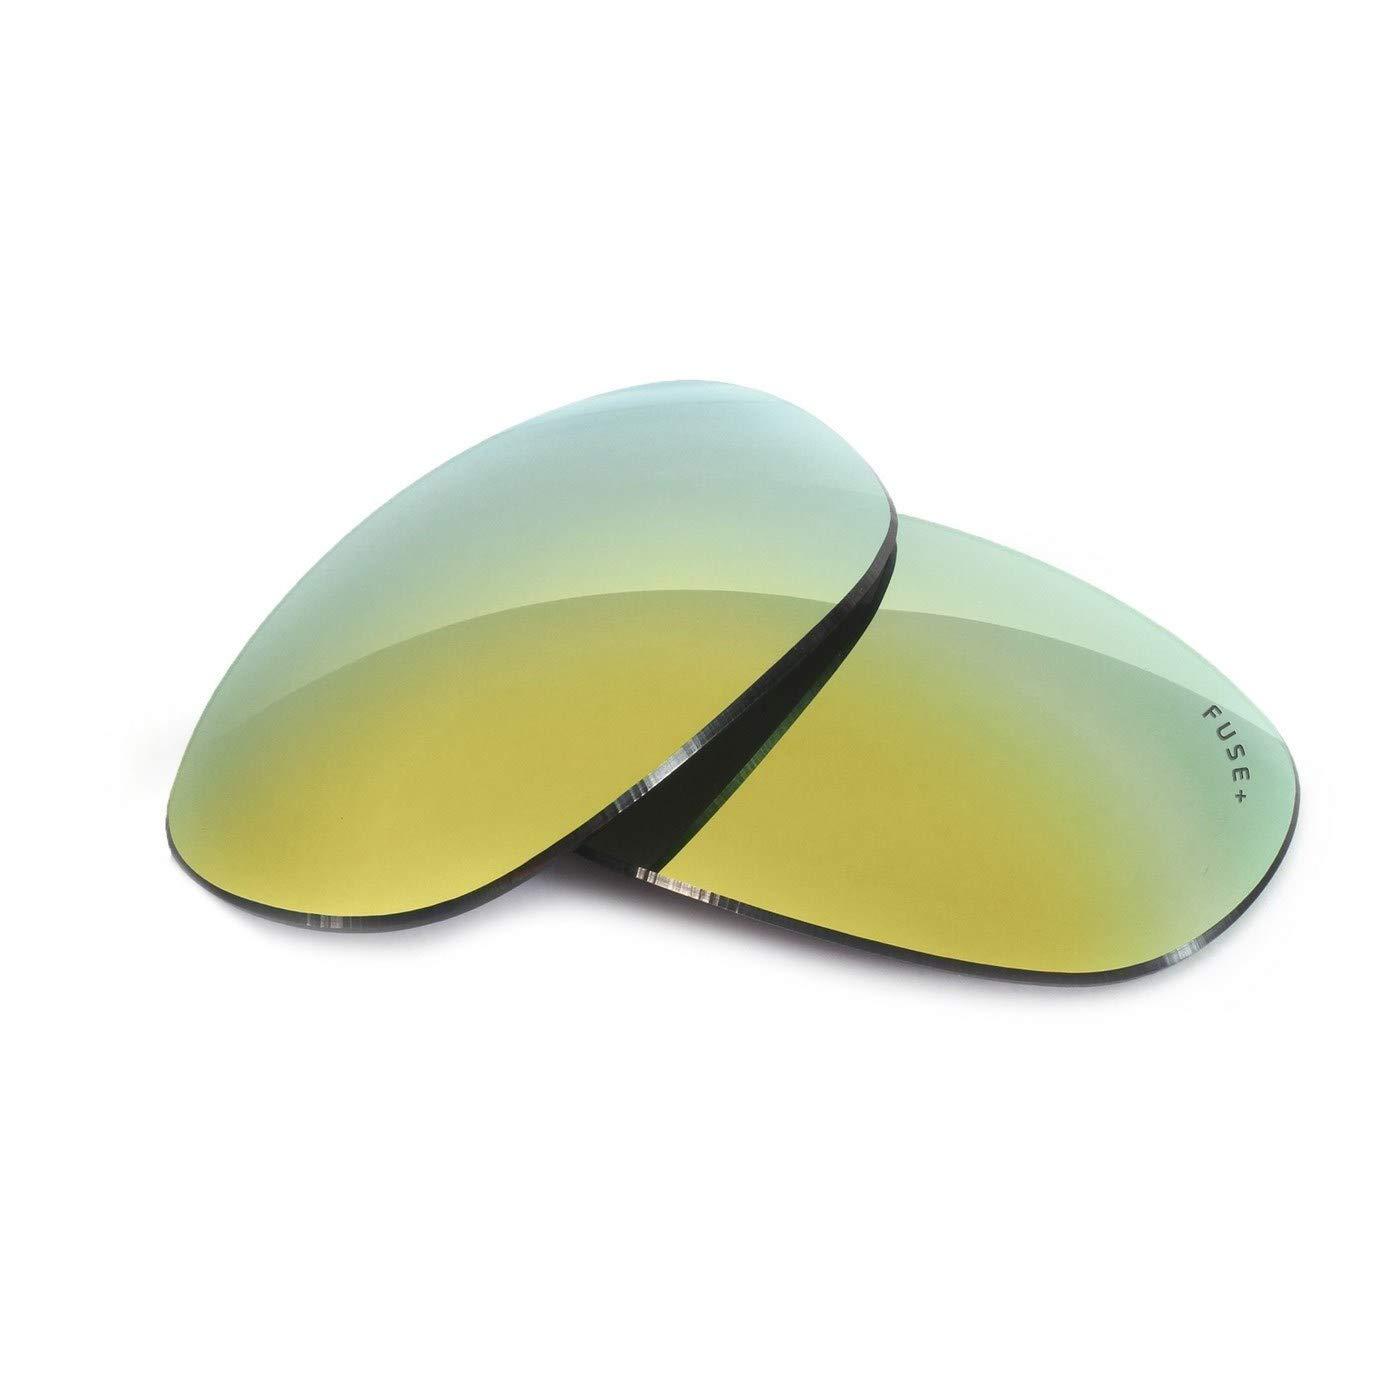 Plus Replacement Lenses for Kaenon 601 Fuse Lenses Fuse